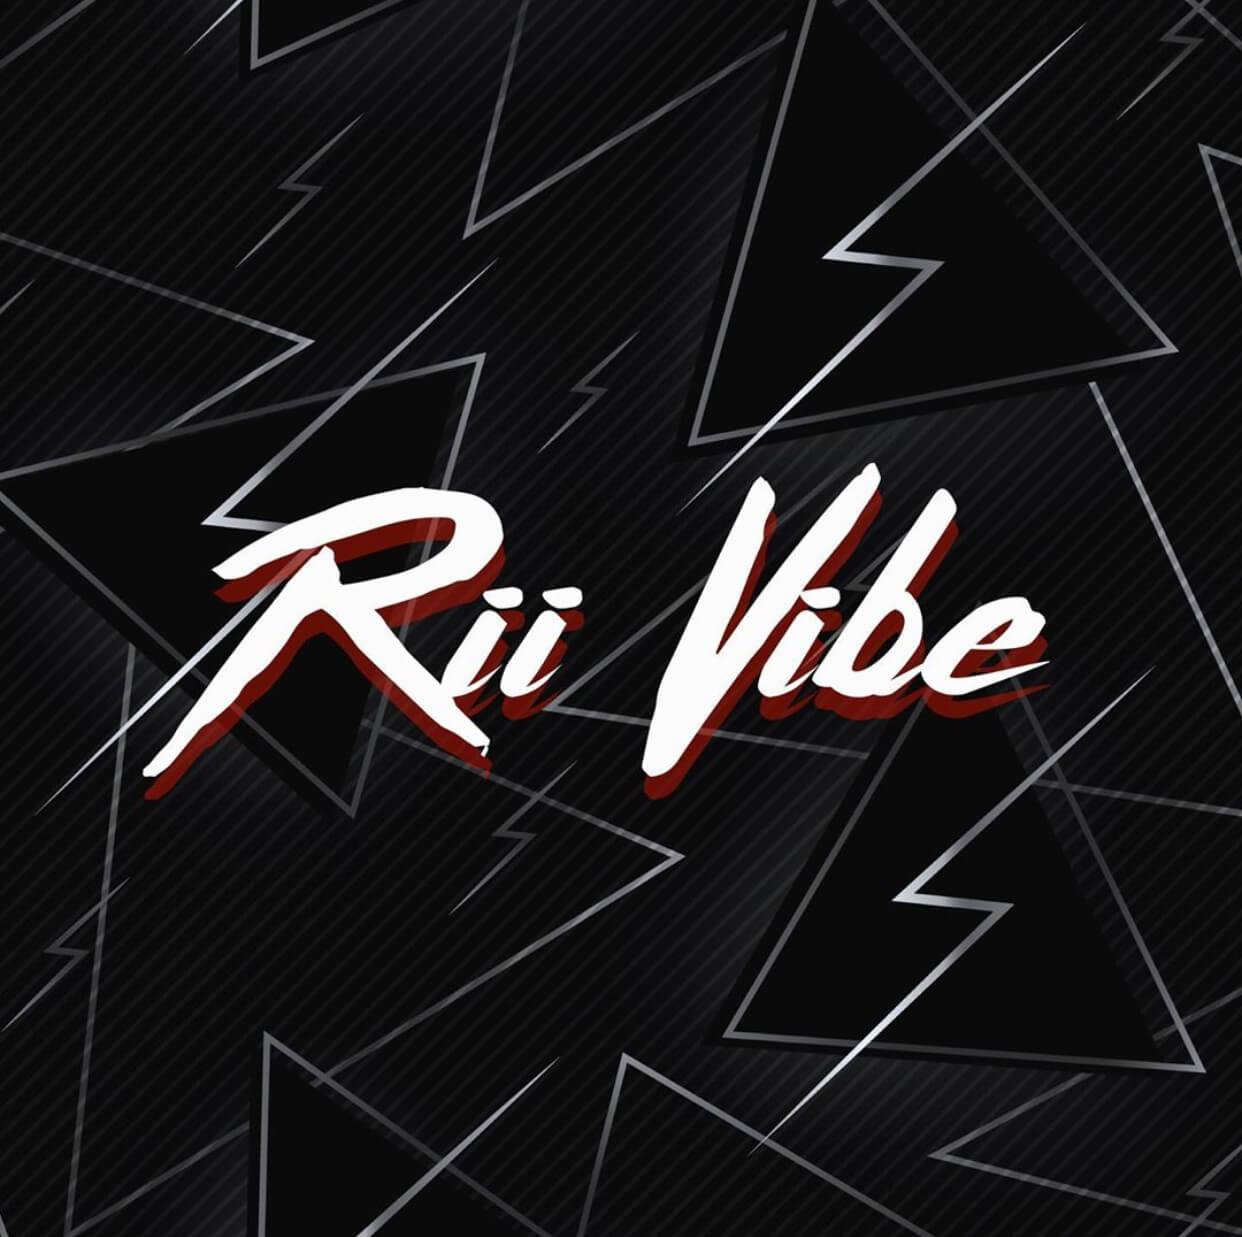 Pheelz – Rii Vibe mp3 download